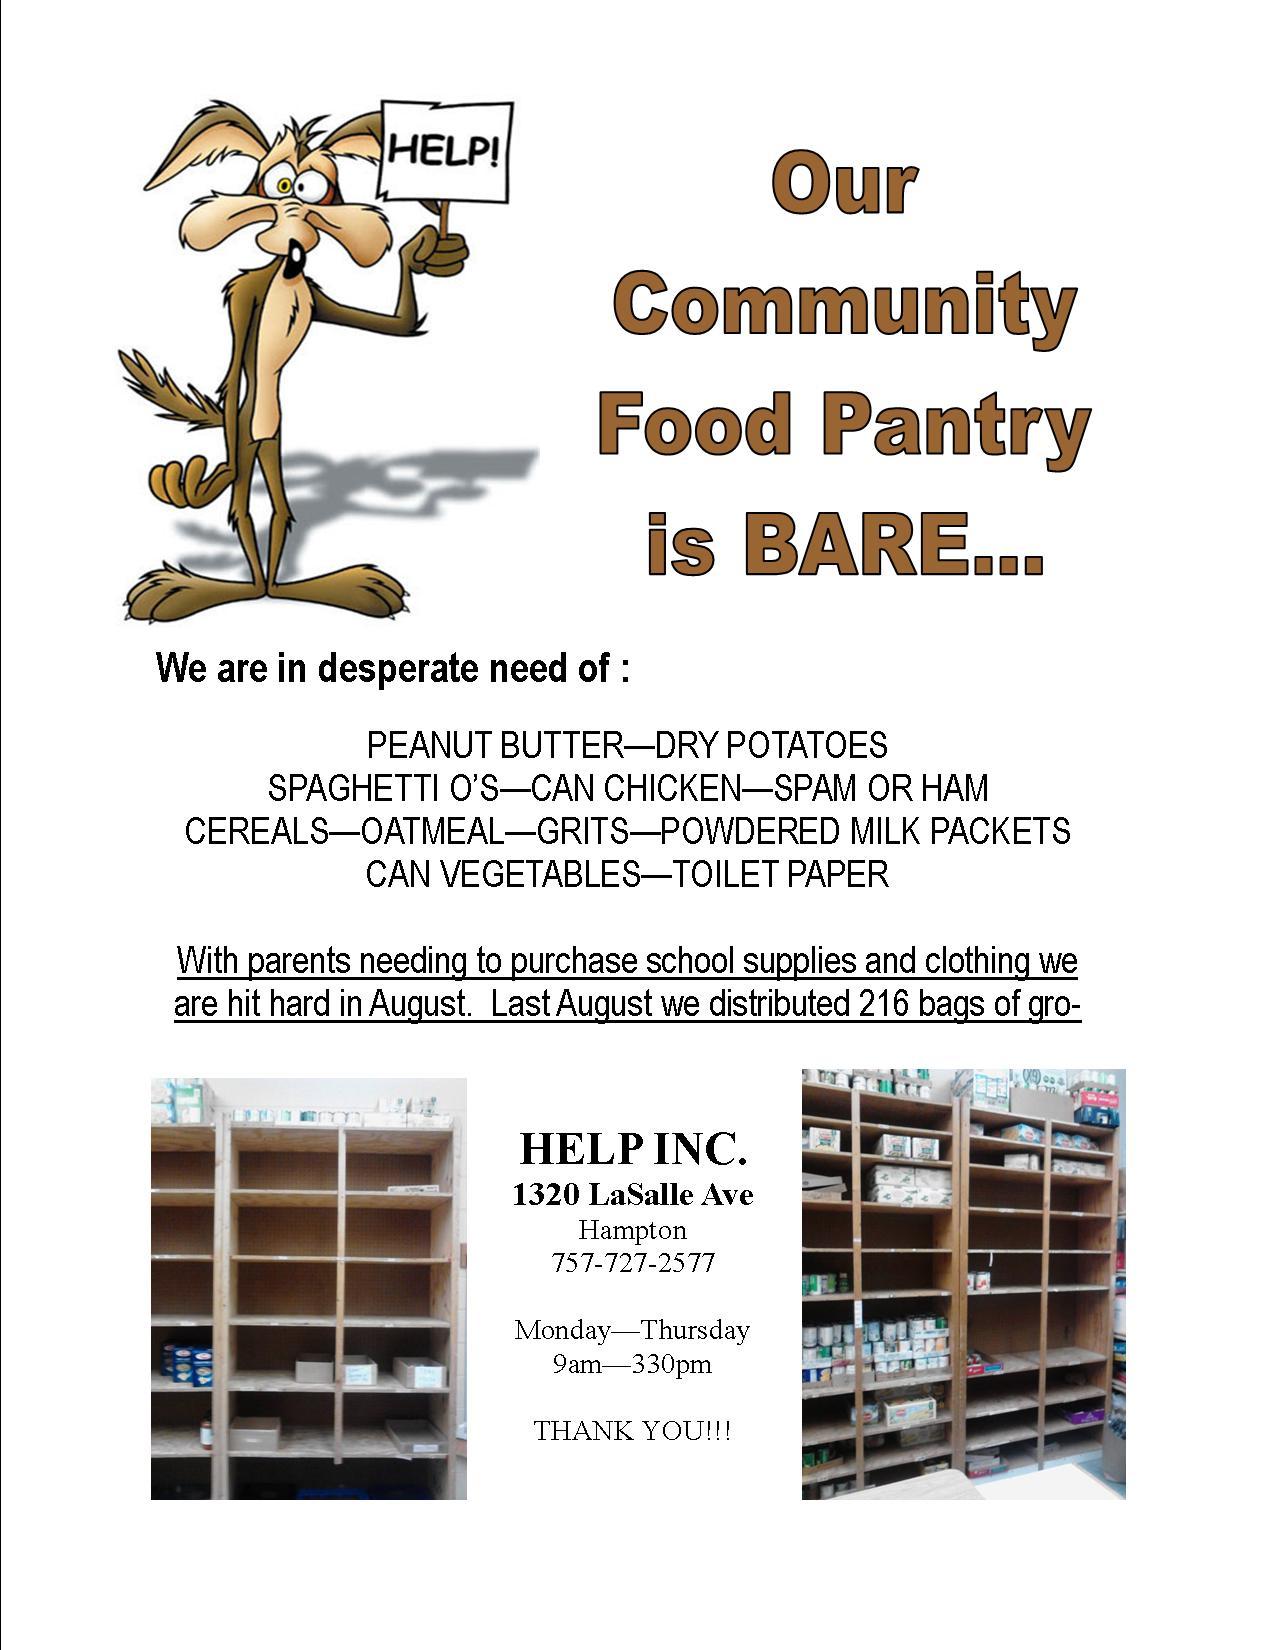 Community-Food-Pantry-Bare-2-002.jpg